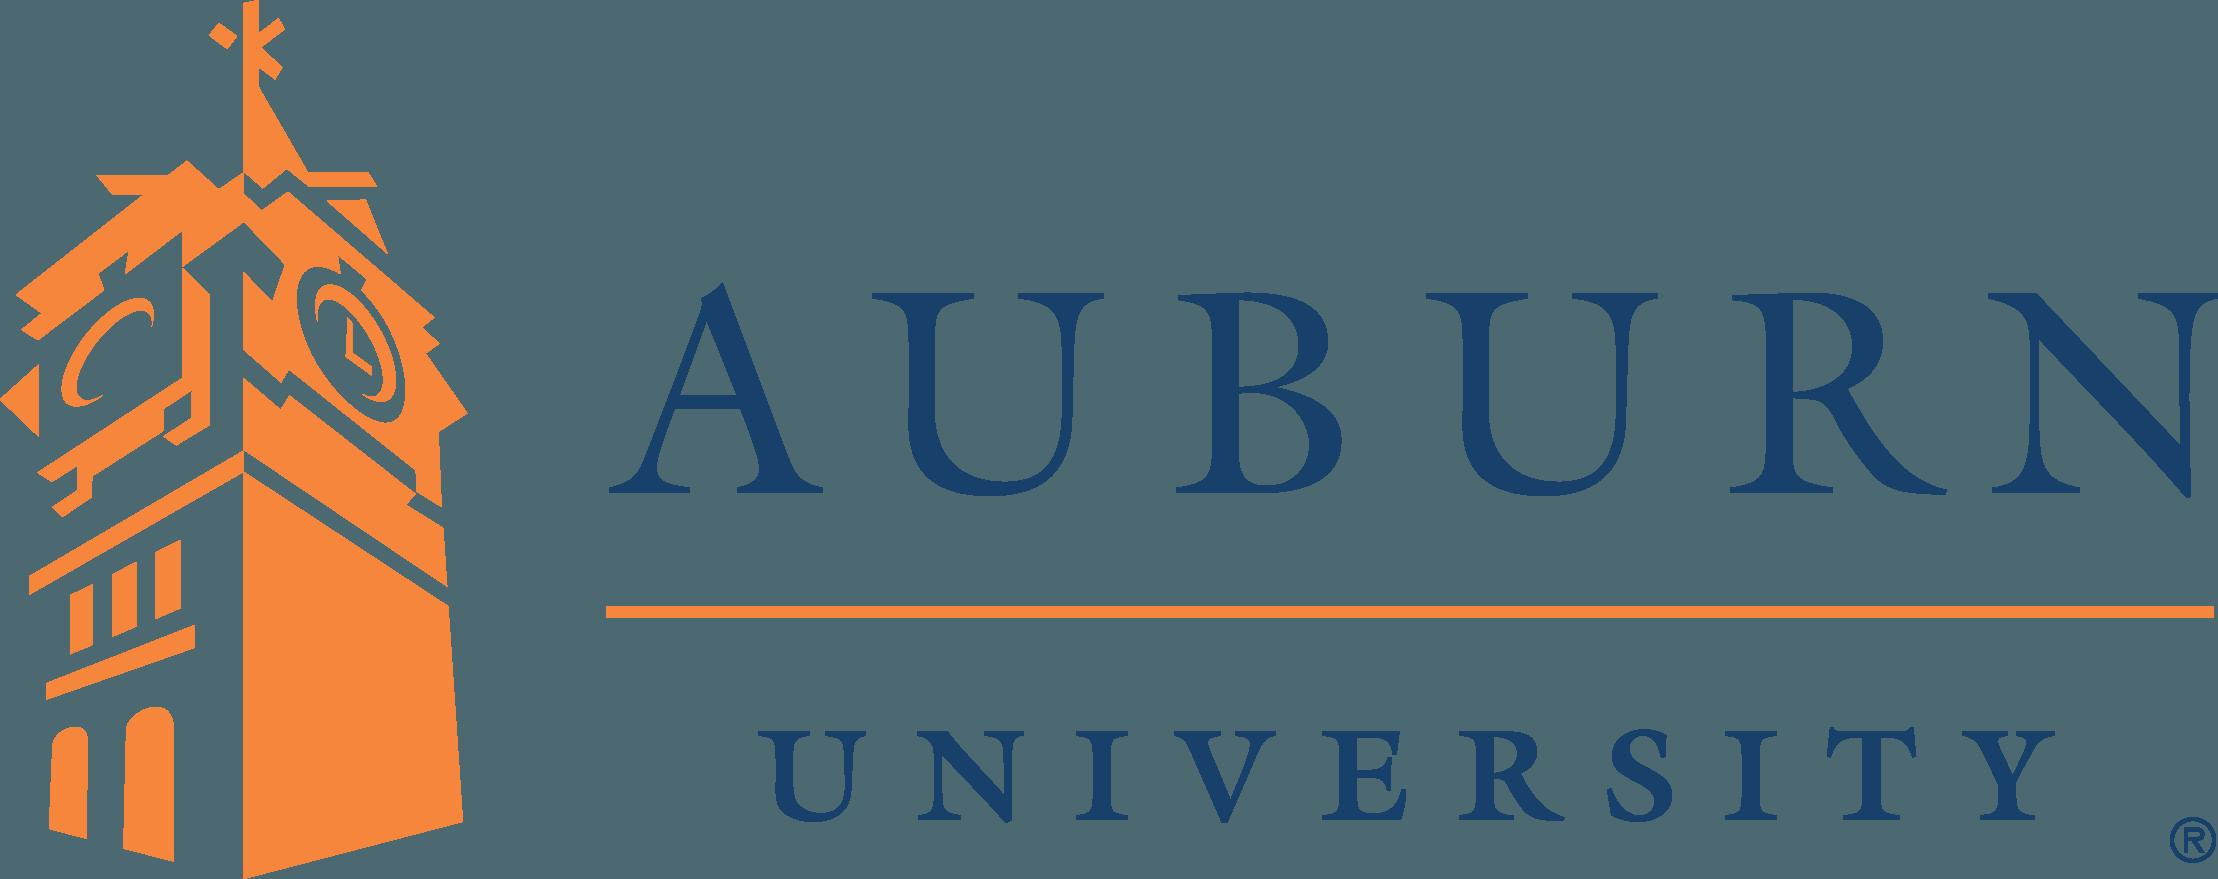 auburn university seal and logos png svg download rh freelogovectors net auburn university logo clip art auburn university logo coloring page